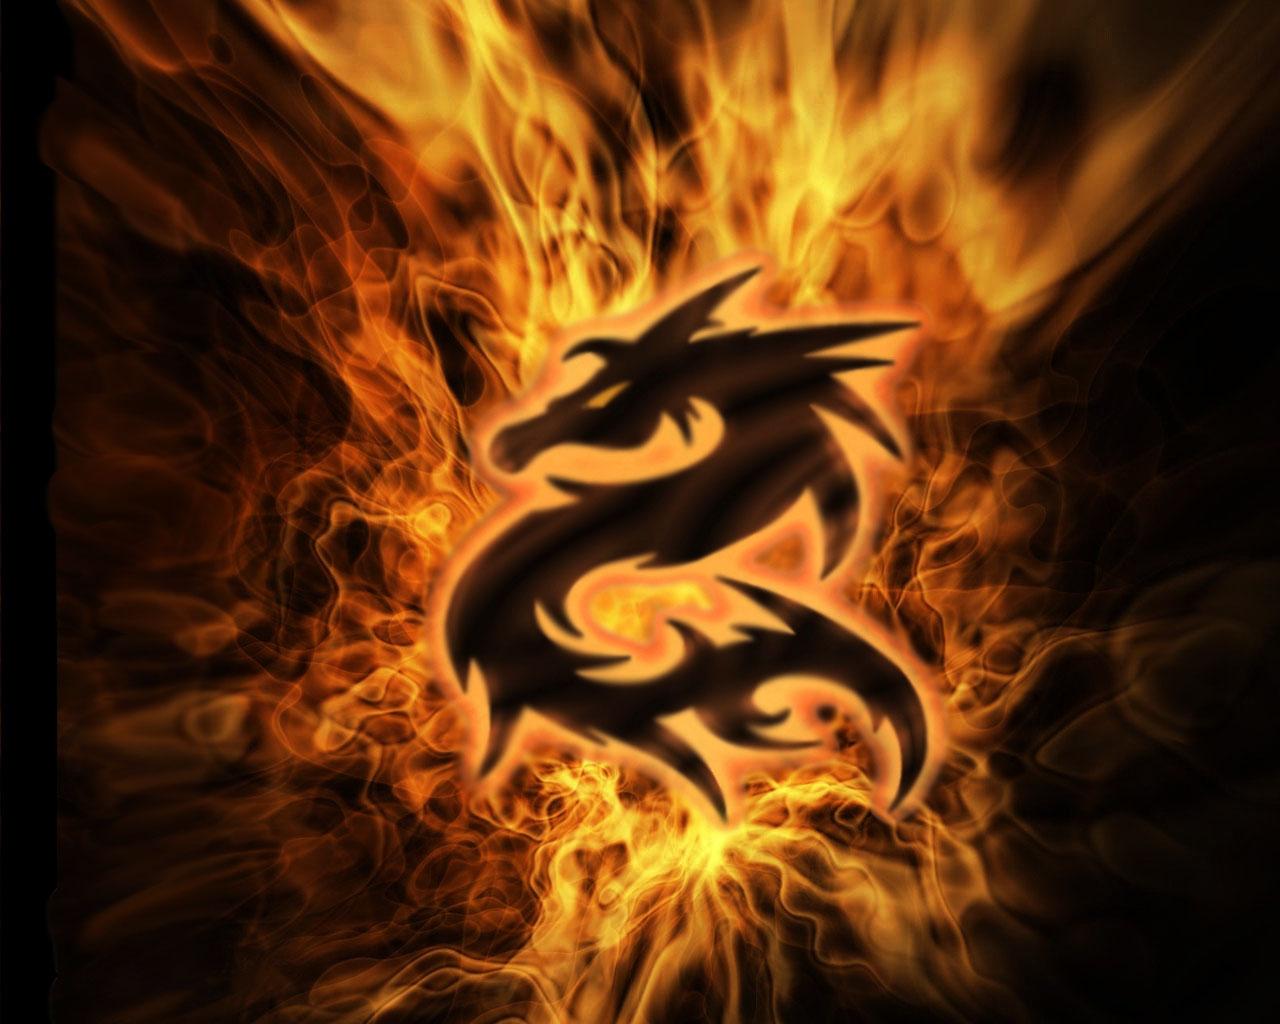 Dragons Wallpapers Picgifs Com